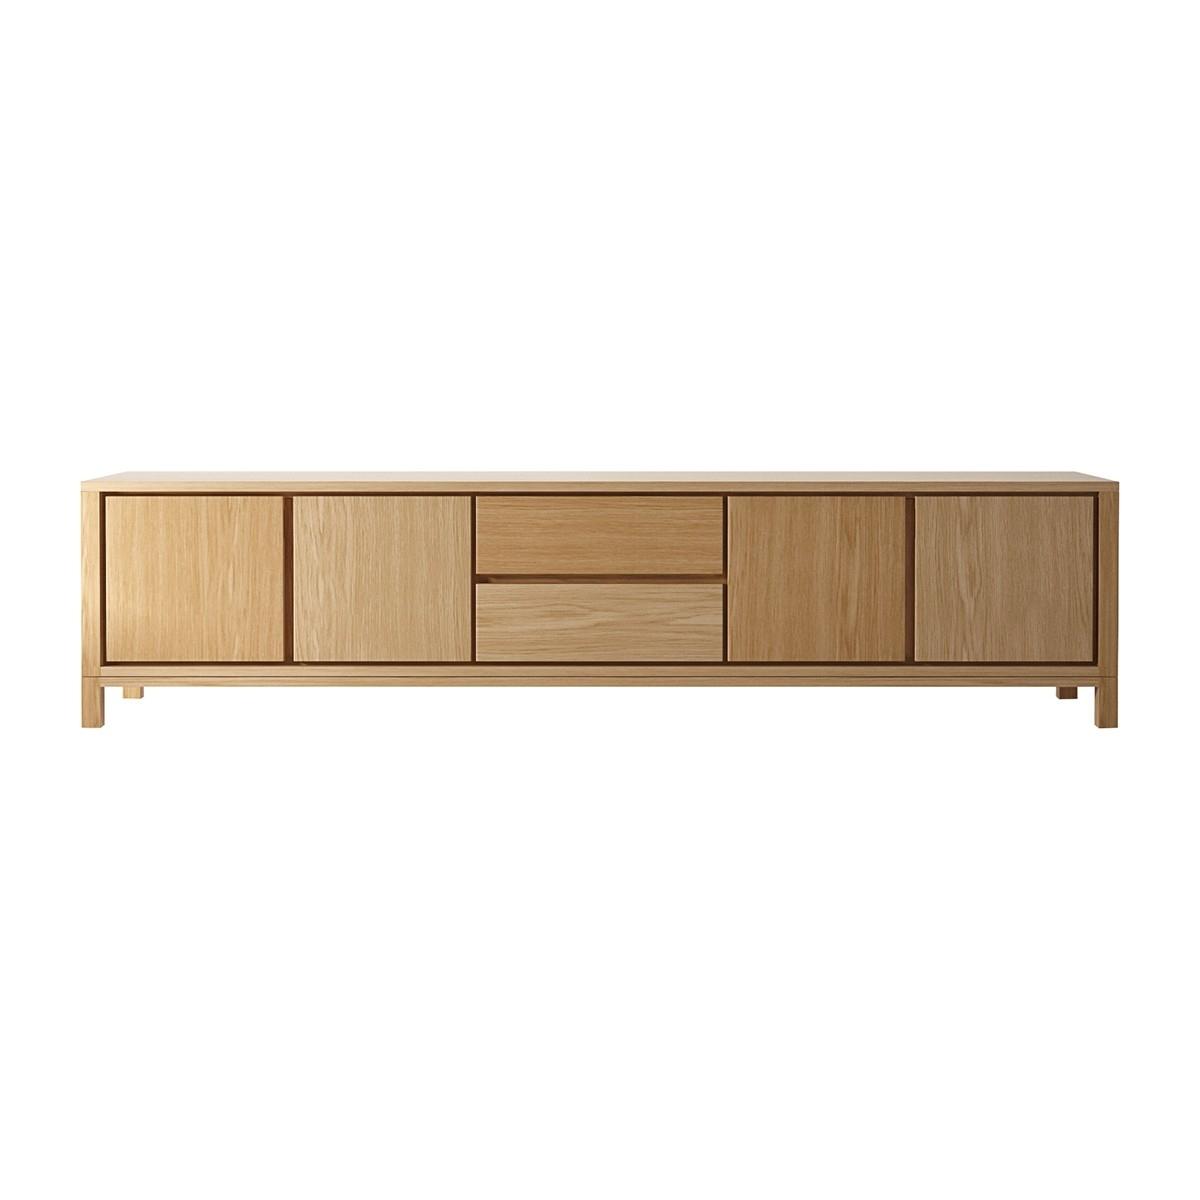 Karpenter - Solid Sideboard 2 Drawers & 4 Doors - Modern Sideboards regarding 2-Drawer Sideboards (Image 19 of 30)